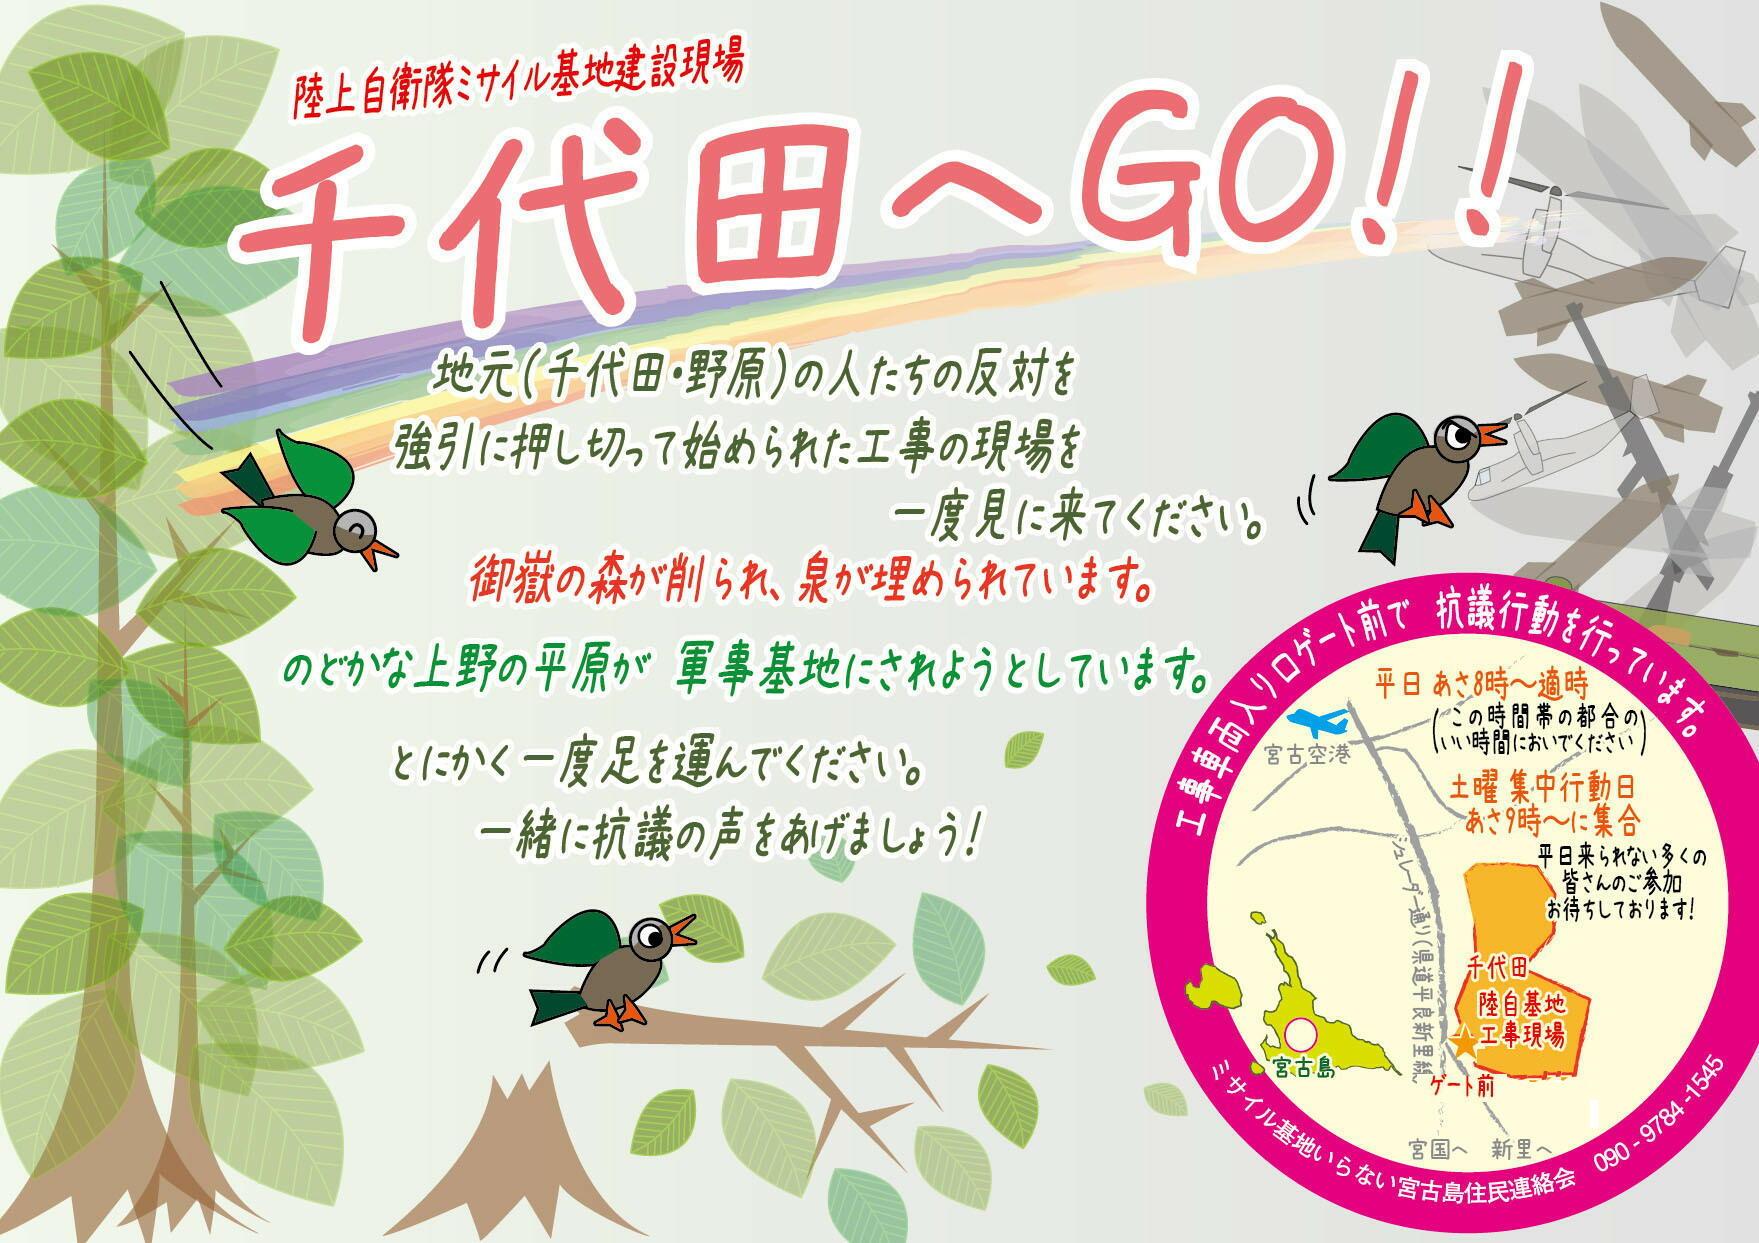 chiyodachirasi01Rev.jpg